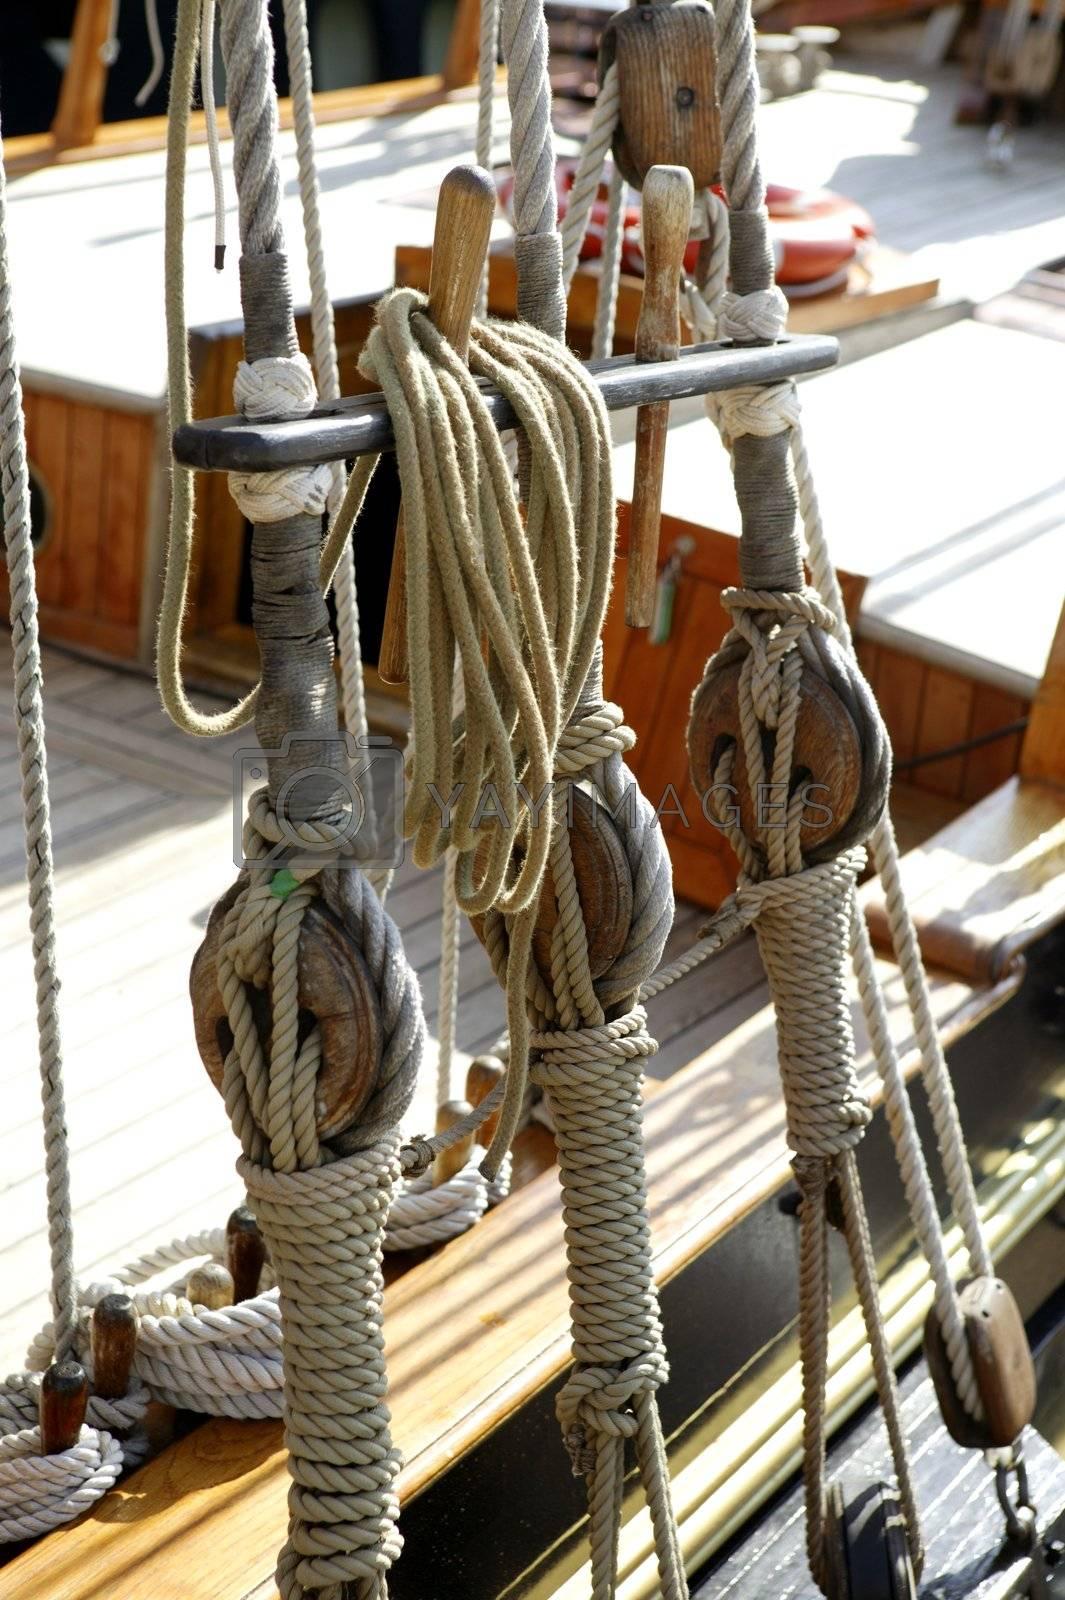 Royalty free image of Sailboat wooden marine rigs and ropes by lunamarina